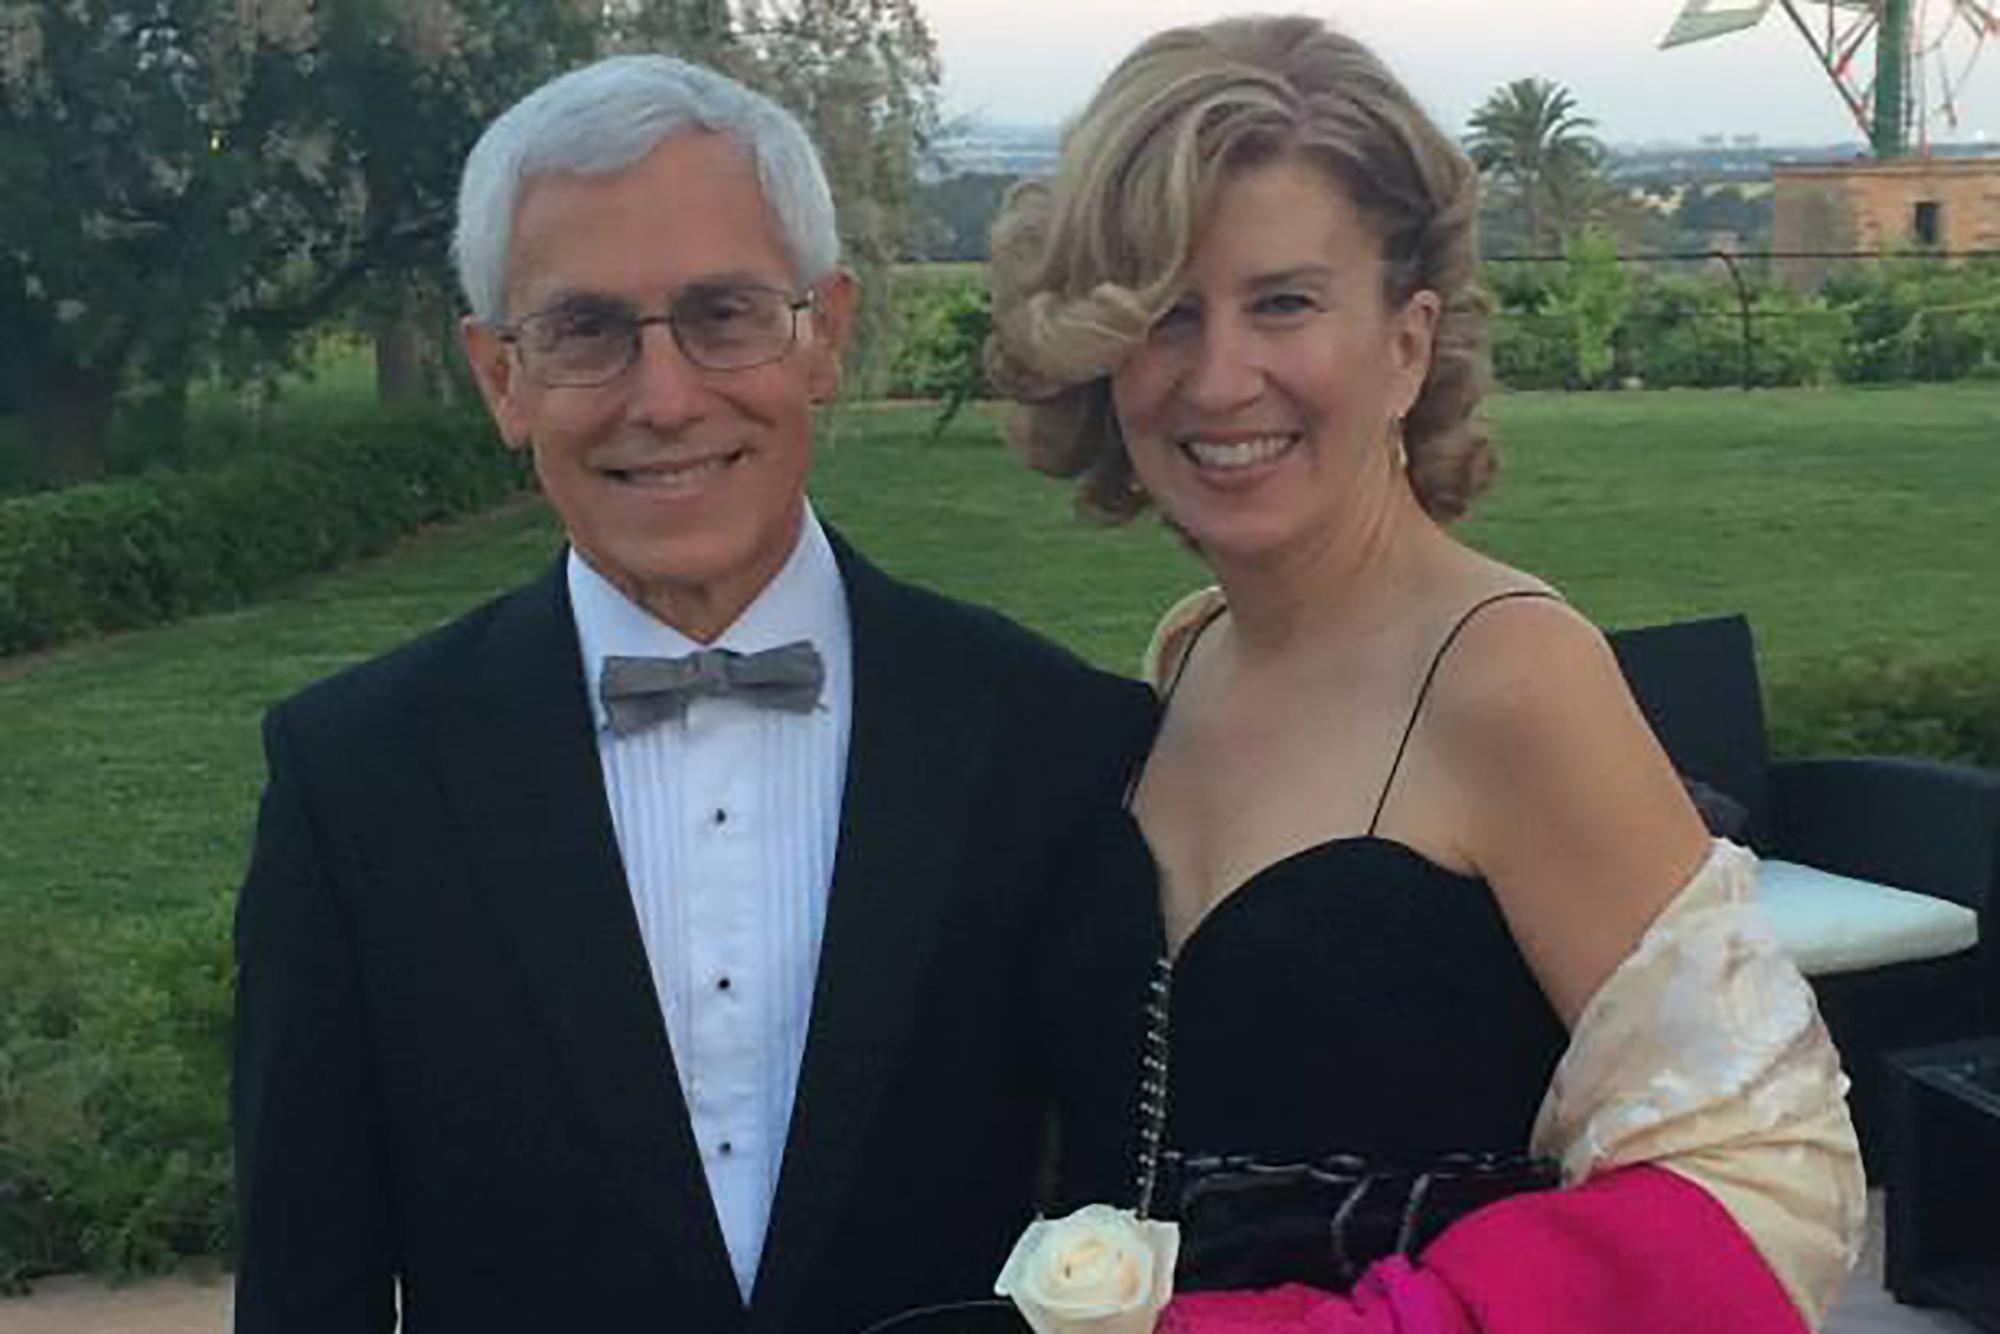 Who are Hilaria Baldwin's parents?